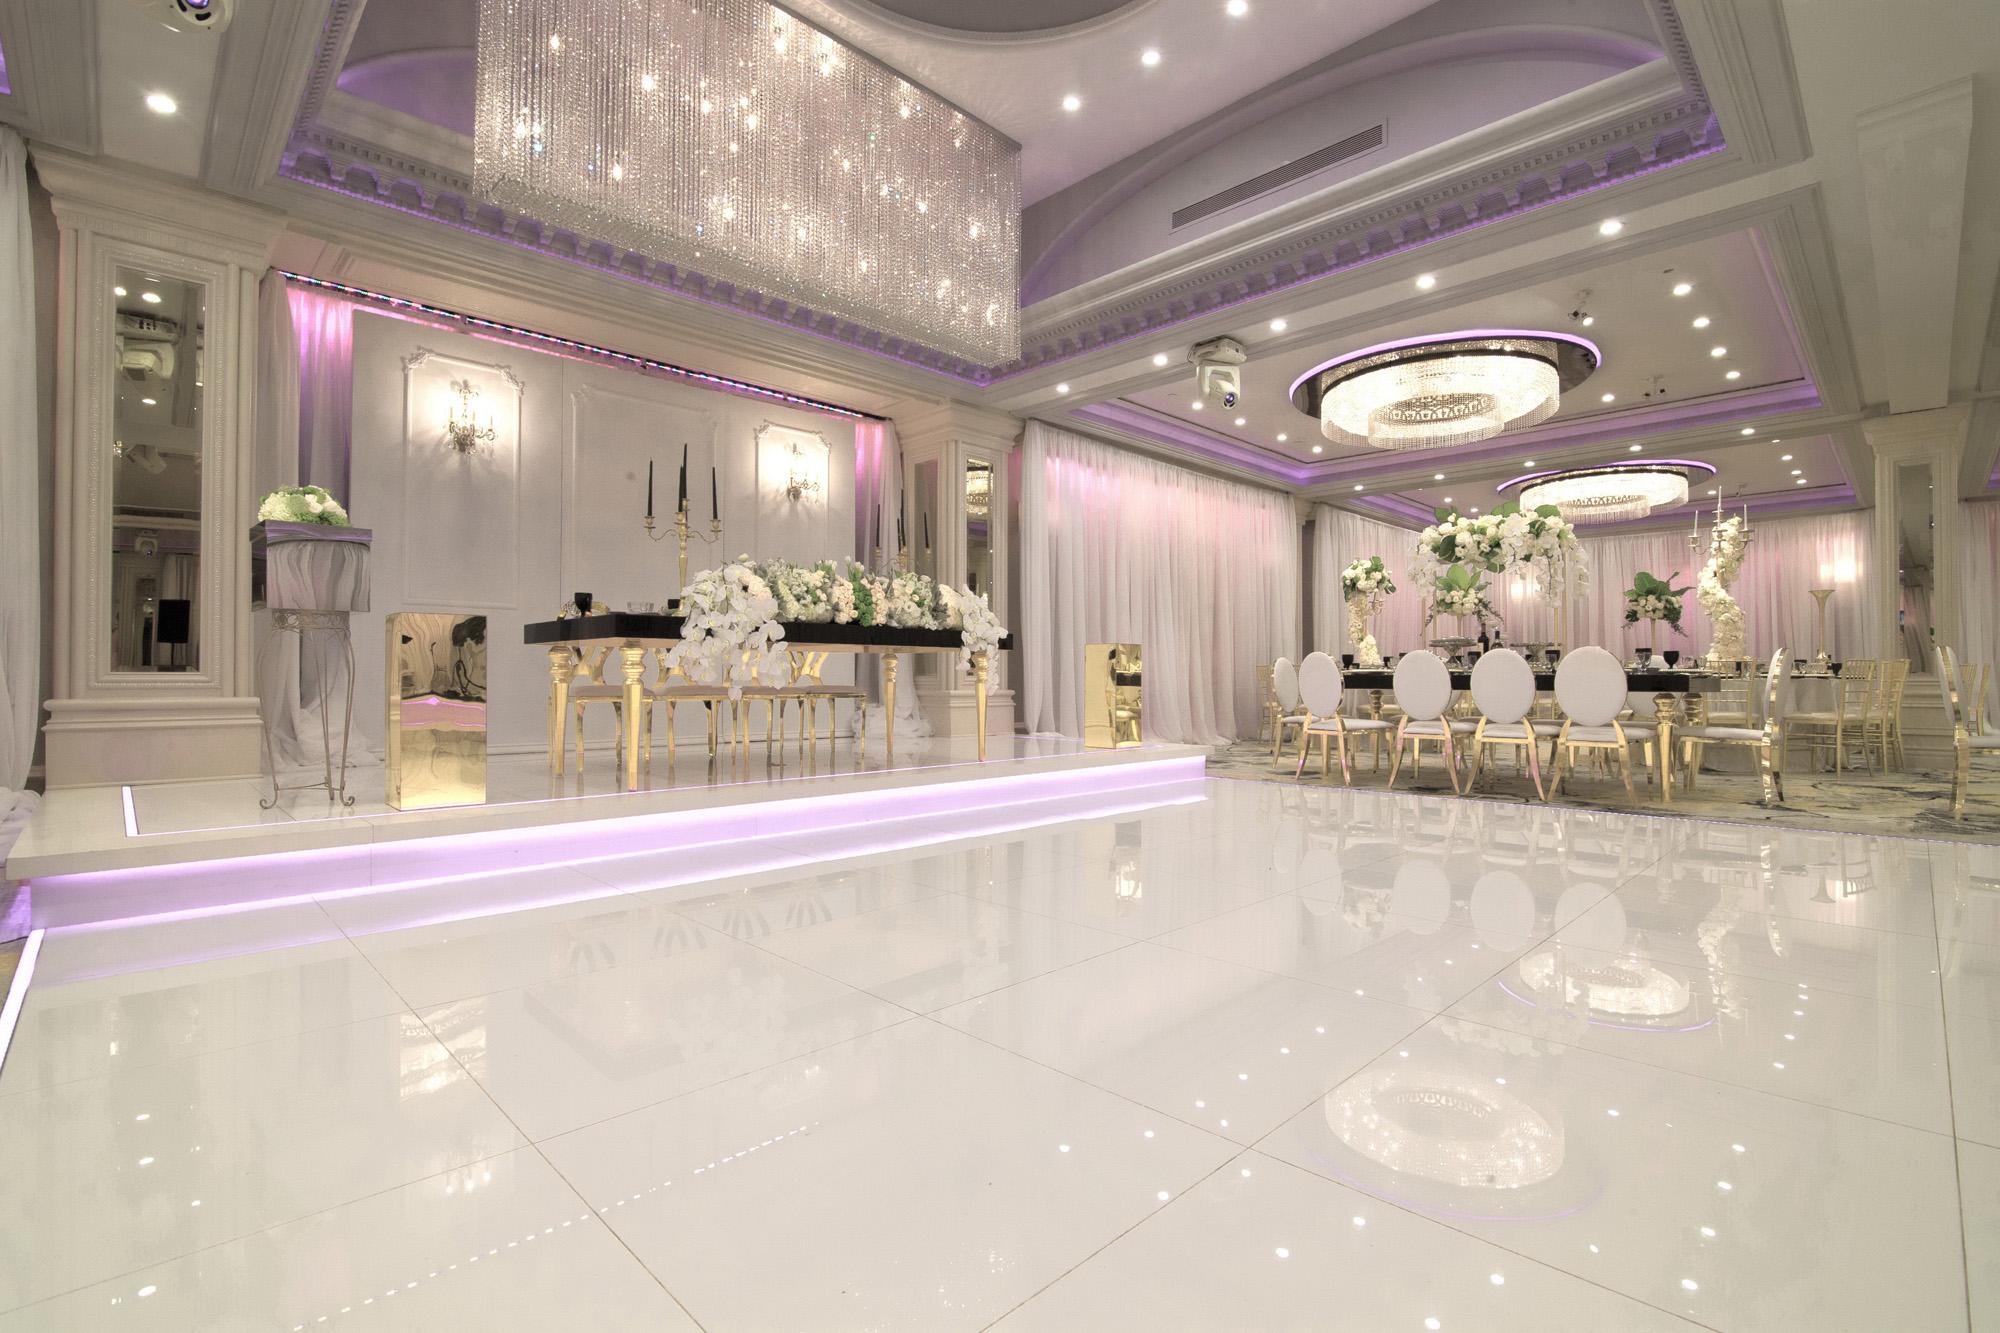 Contemporary Event & Wedding Venues In Glendale, CA